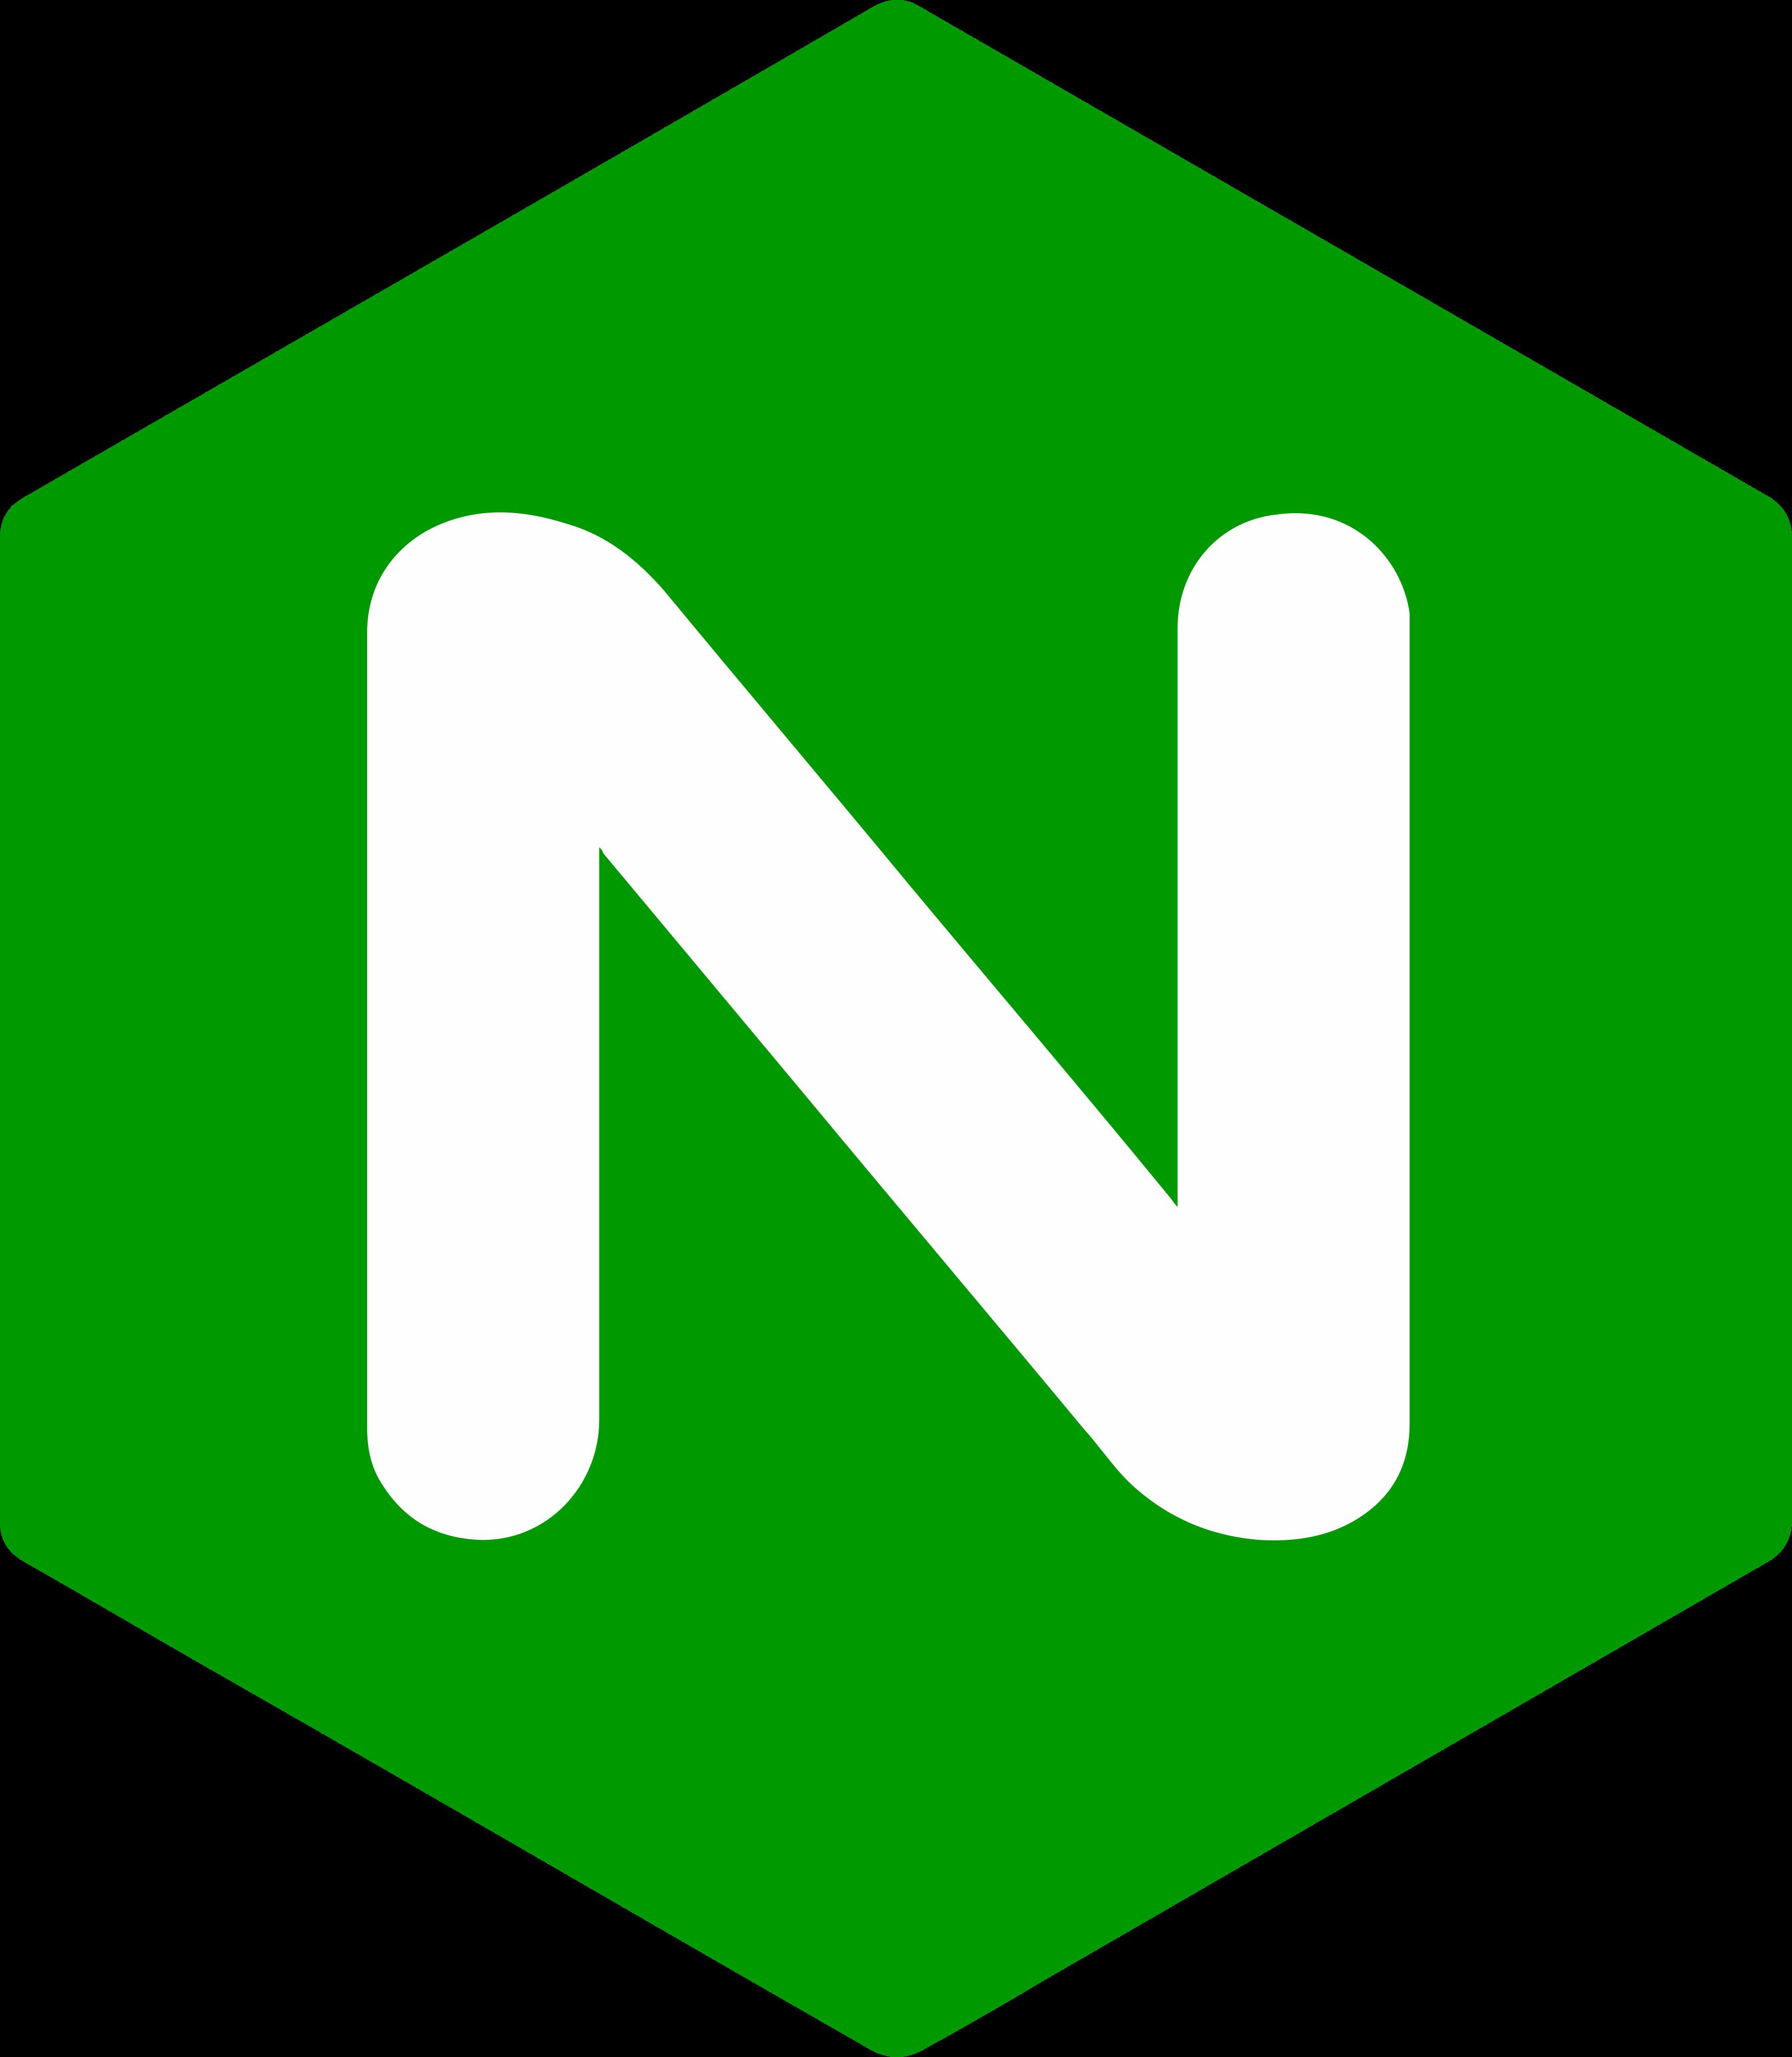 nginx logo 1 - Nginx Logo